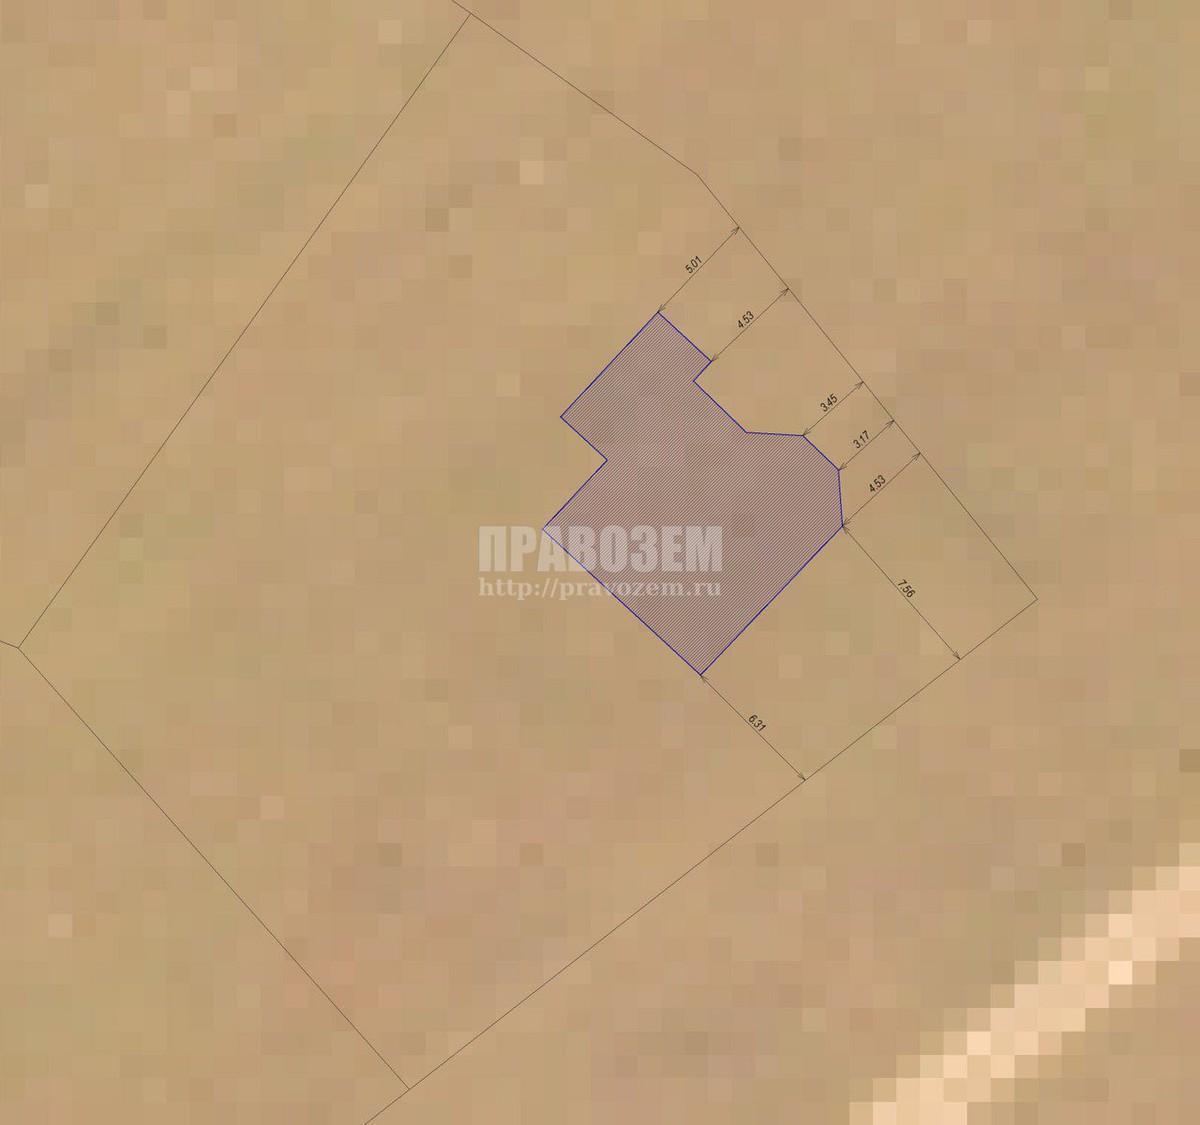 План дома с отступами от дороги А/Н Правозем